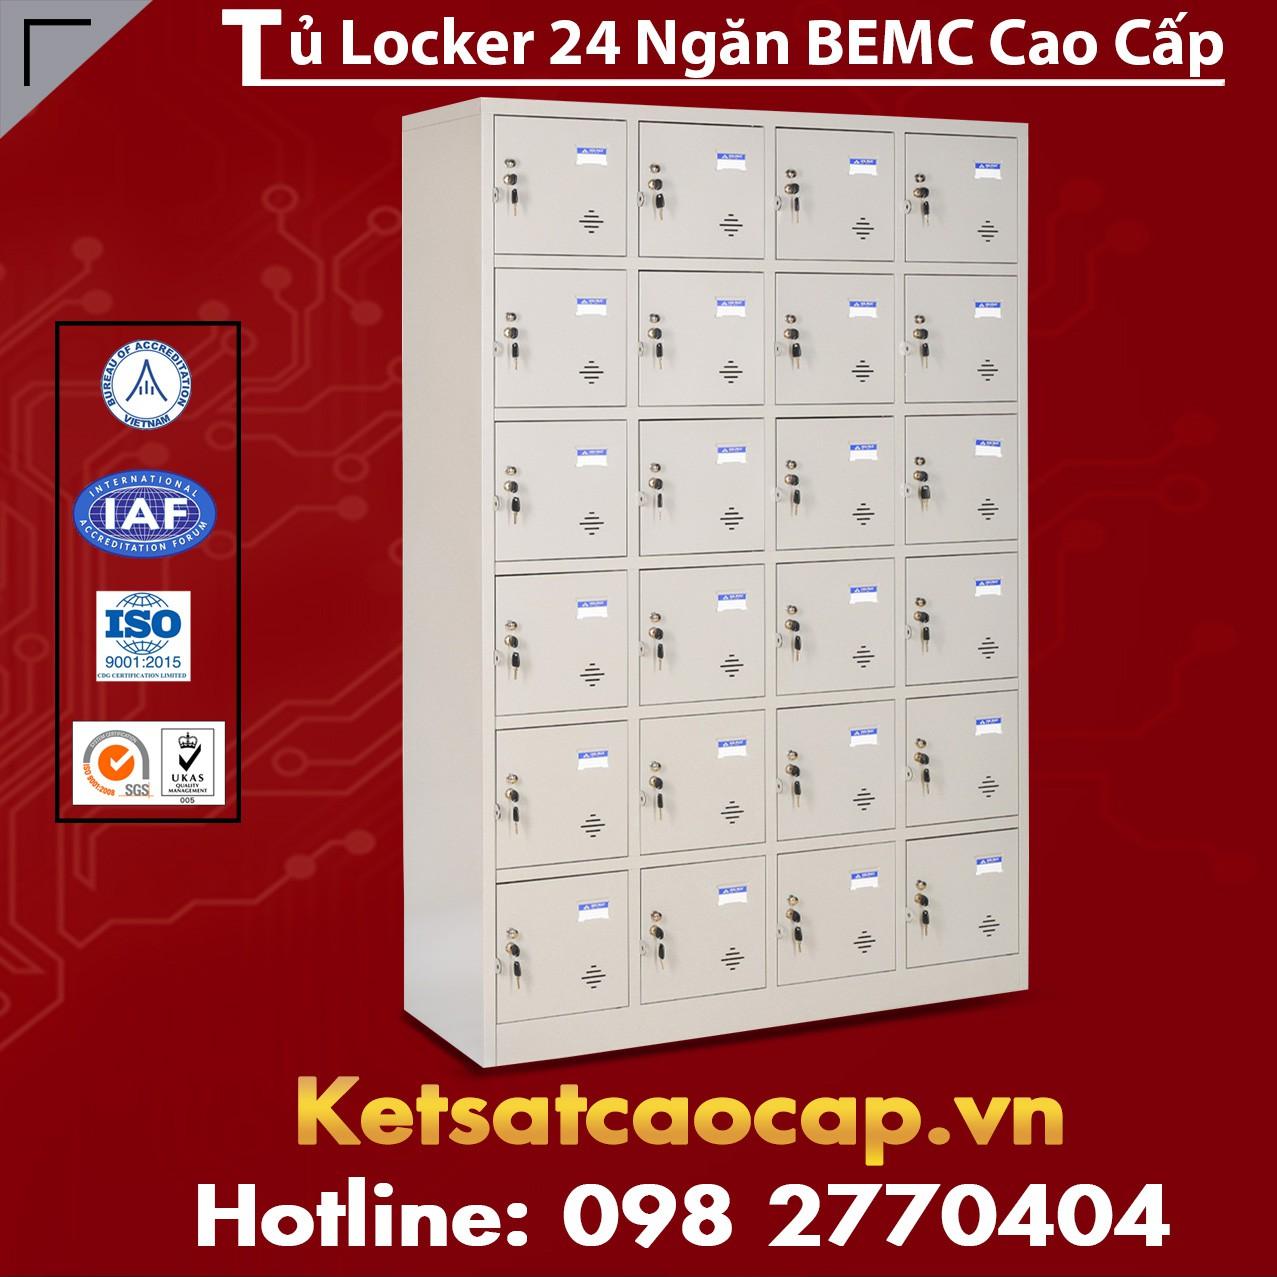 Chuyen Cung Cap Tu Locker Chat Luong Tot